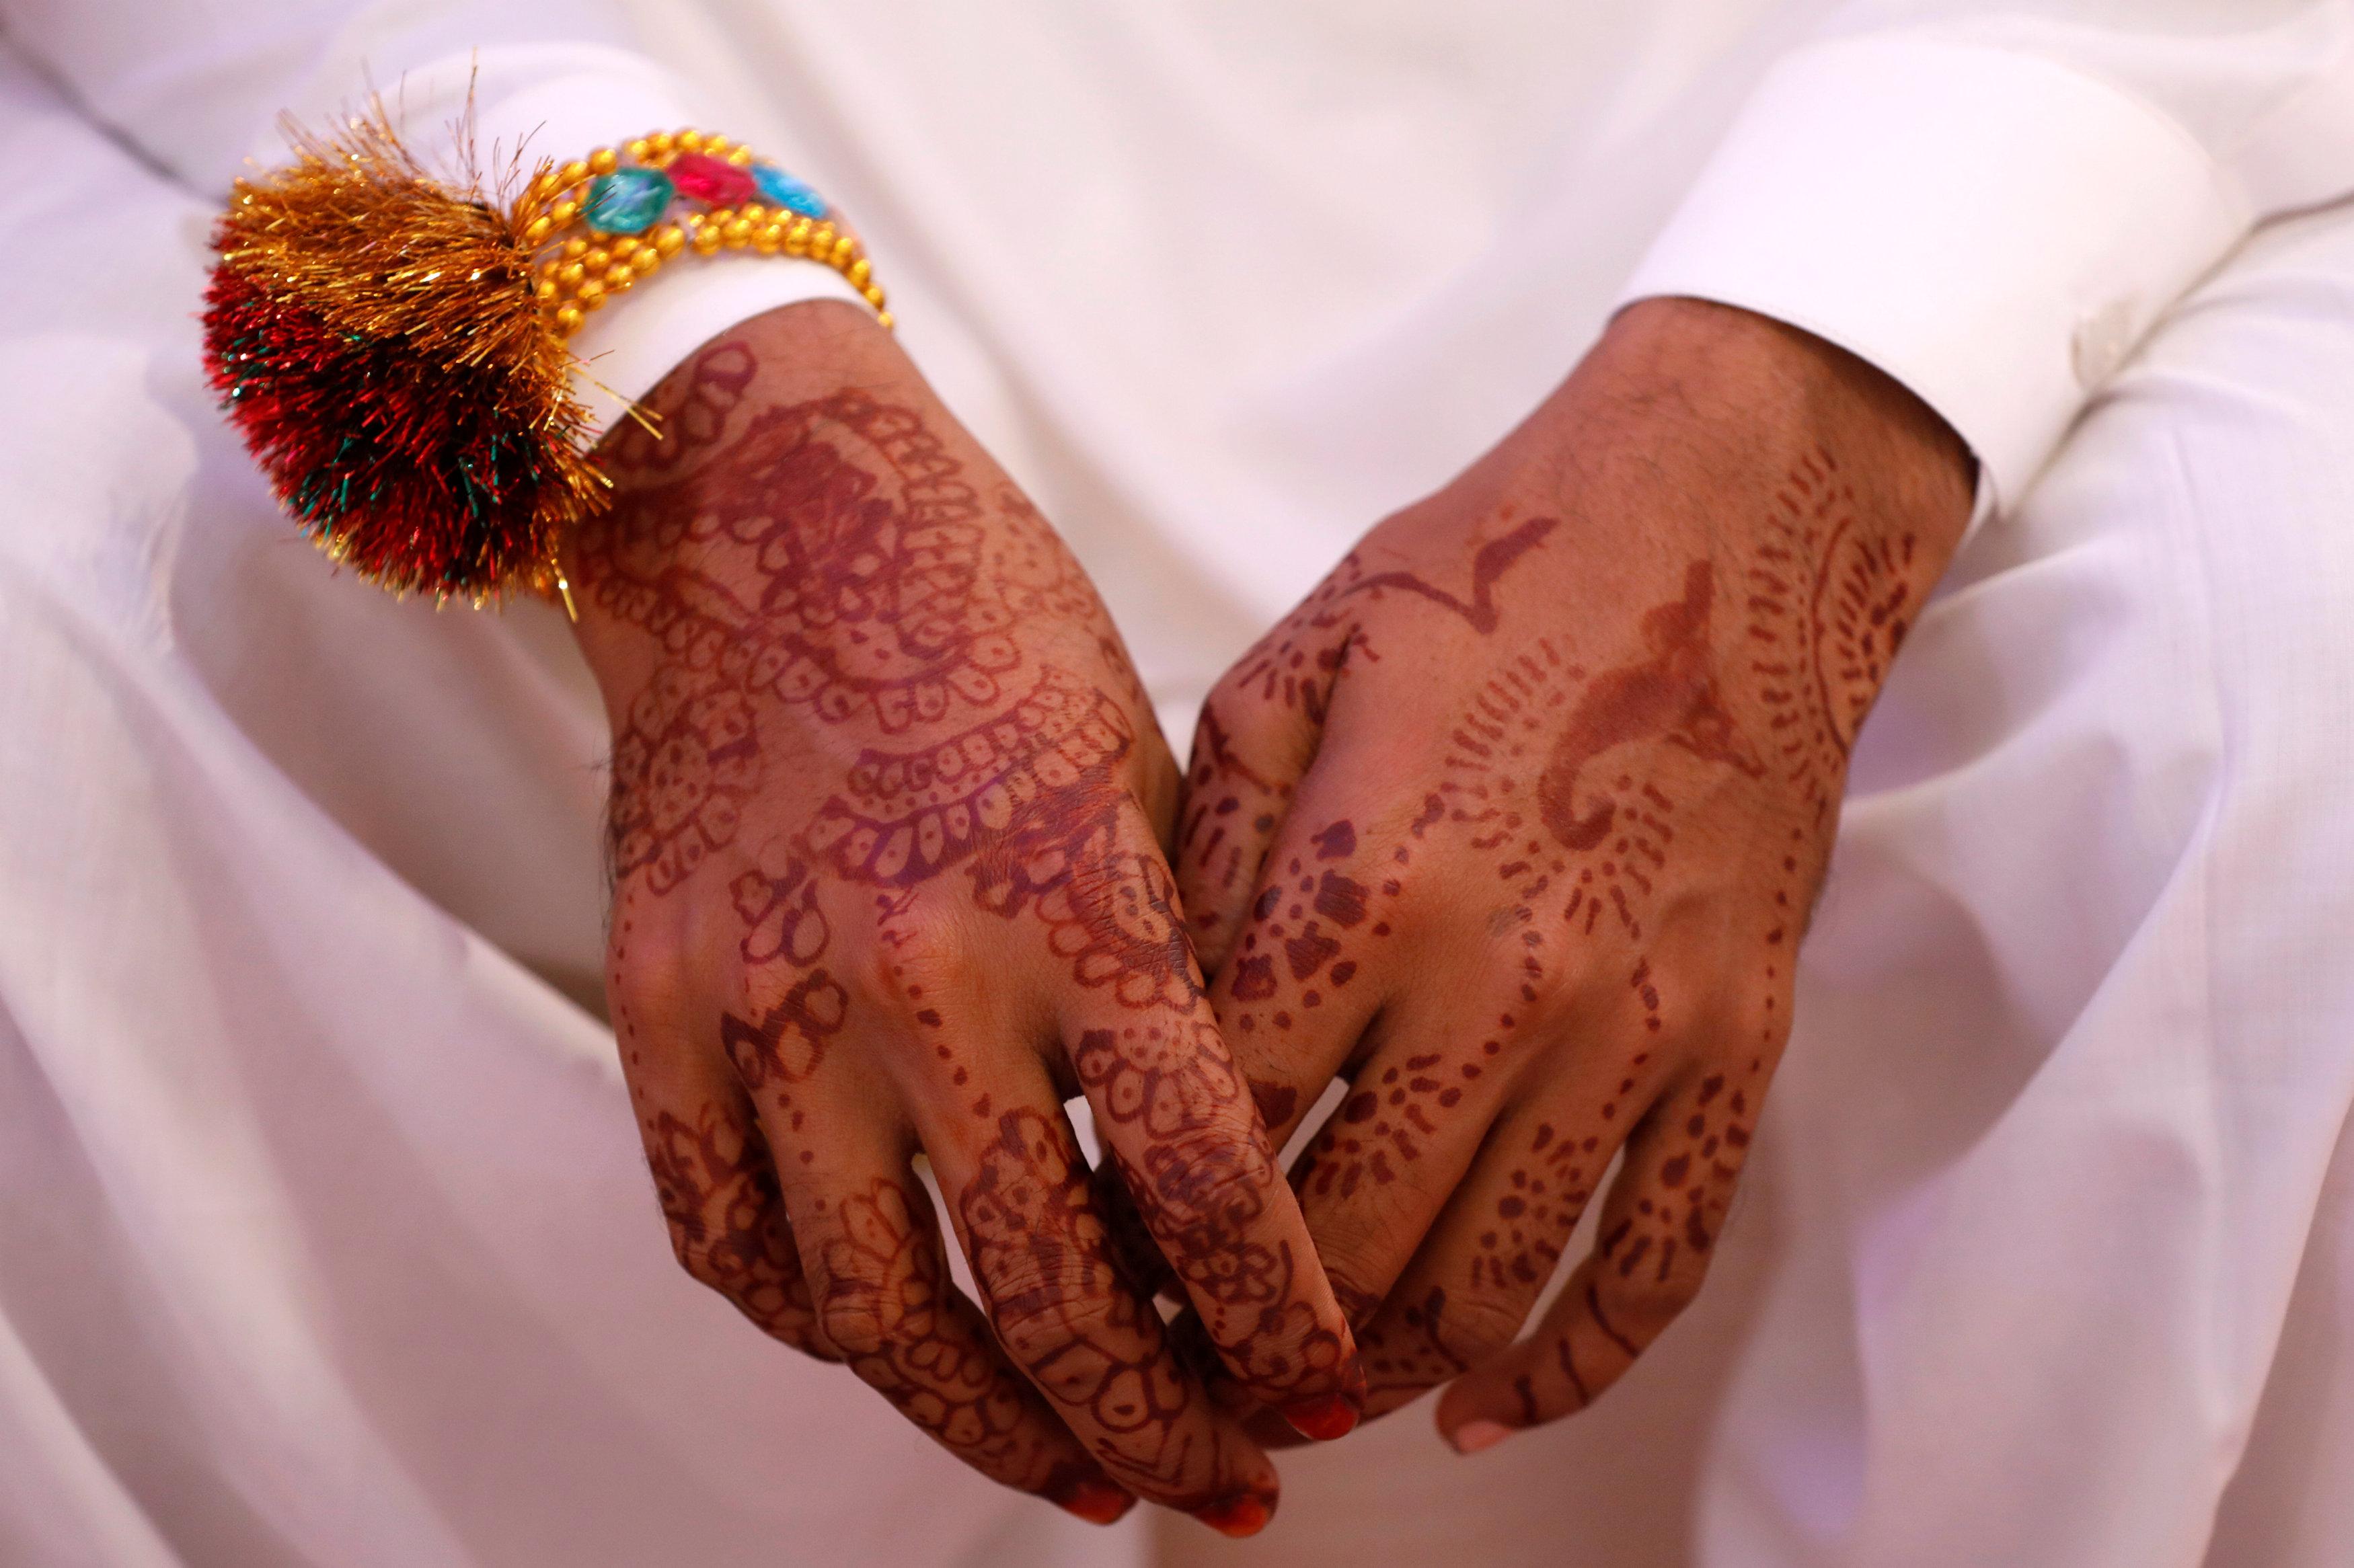 حفل زفاف جماعى للهندوس فى كراتشى (3)